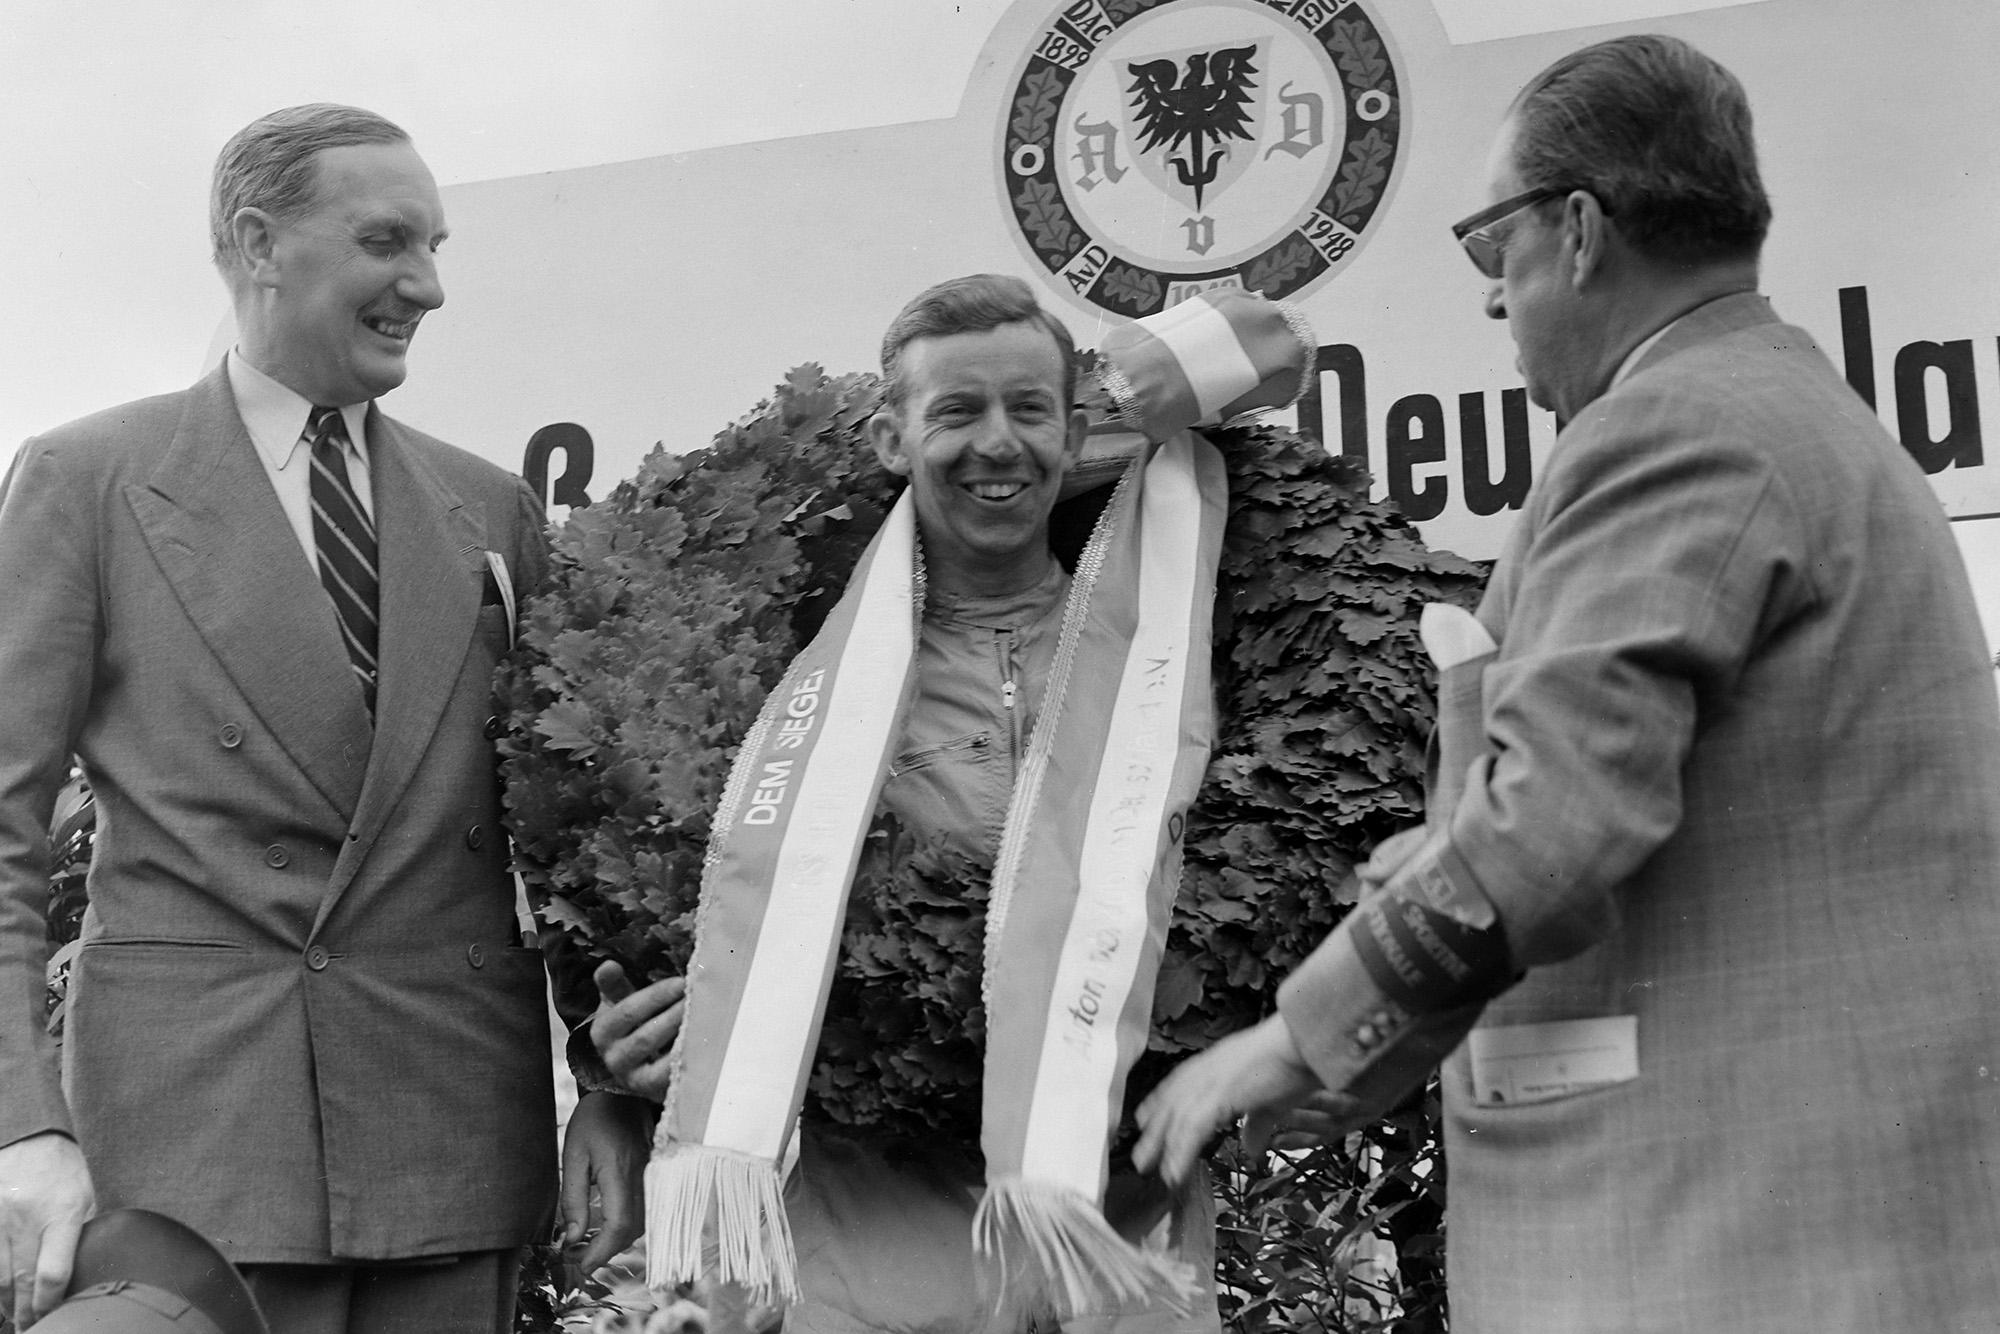 Tony Brooks celebrates winning the 1958 German Grand Prix